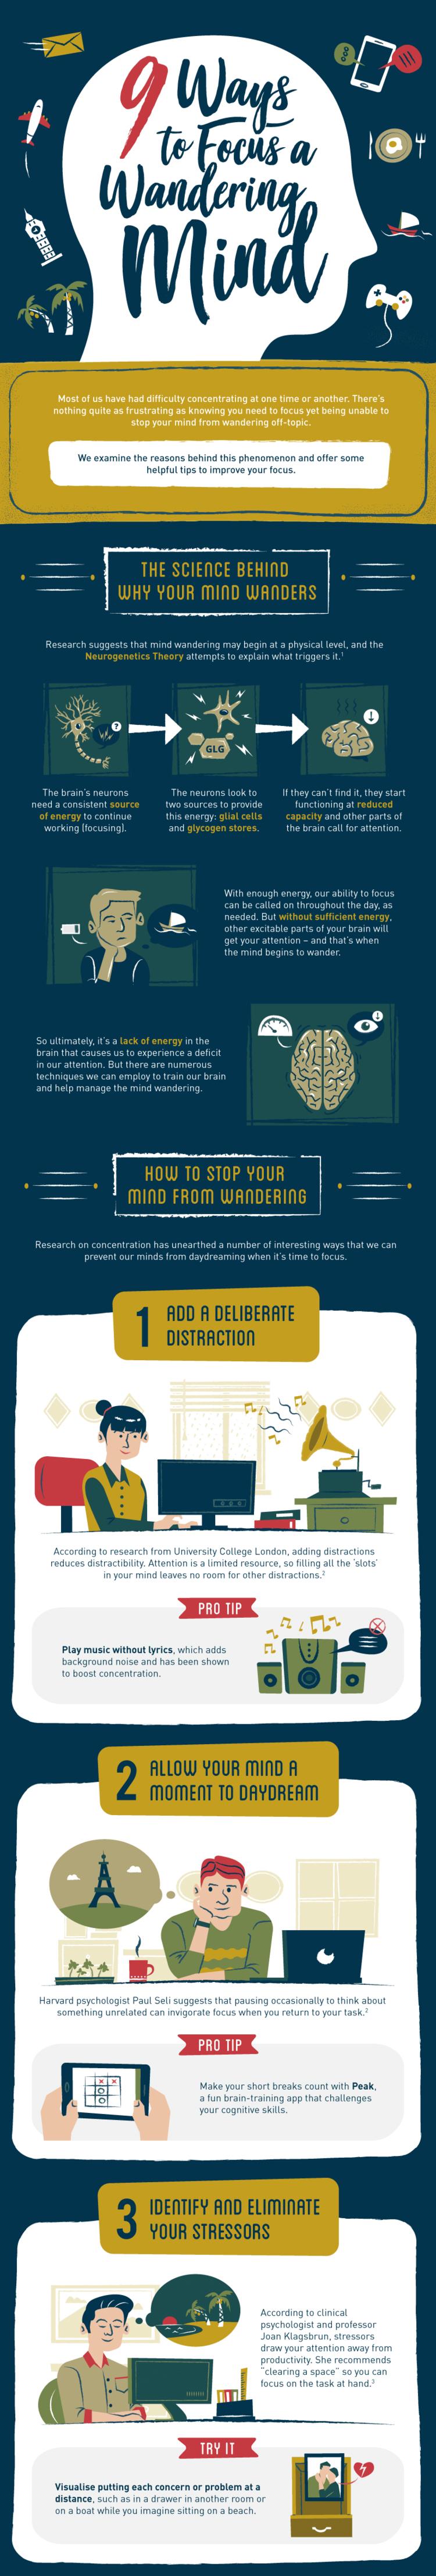 good infographics